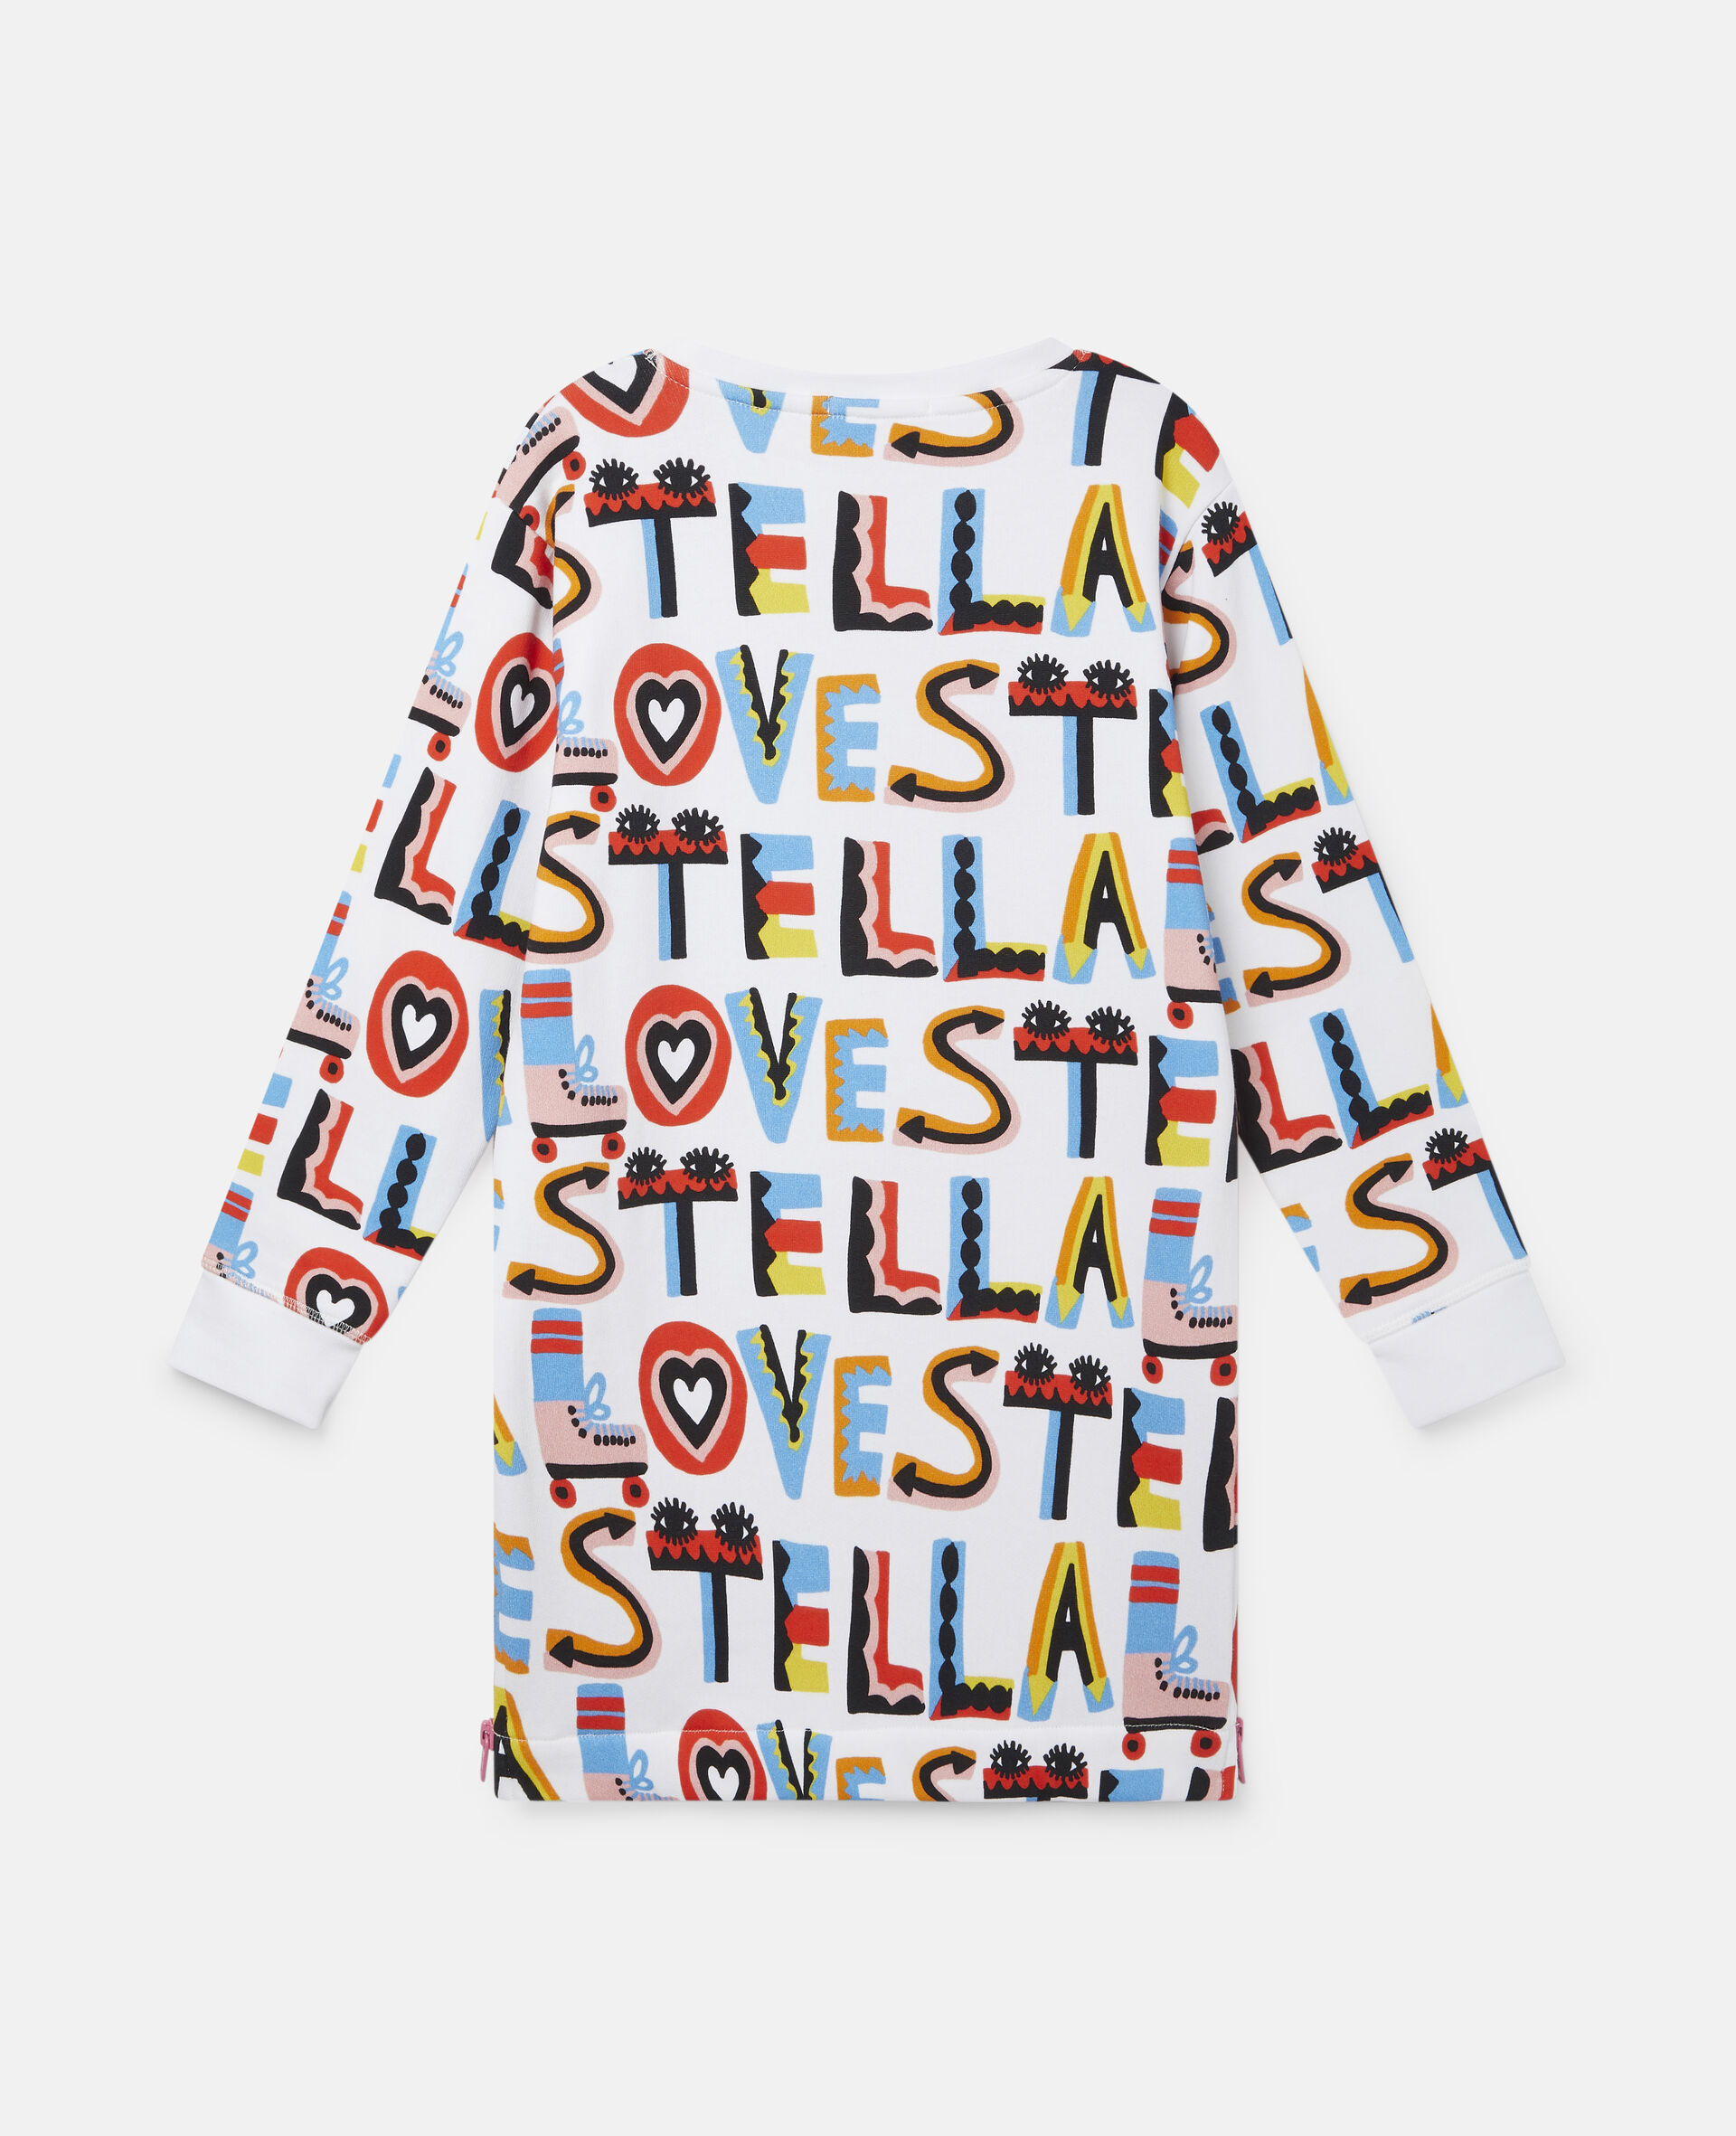 Stella Loves Cotton Fleece Dress-White-large image number 3